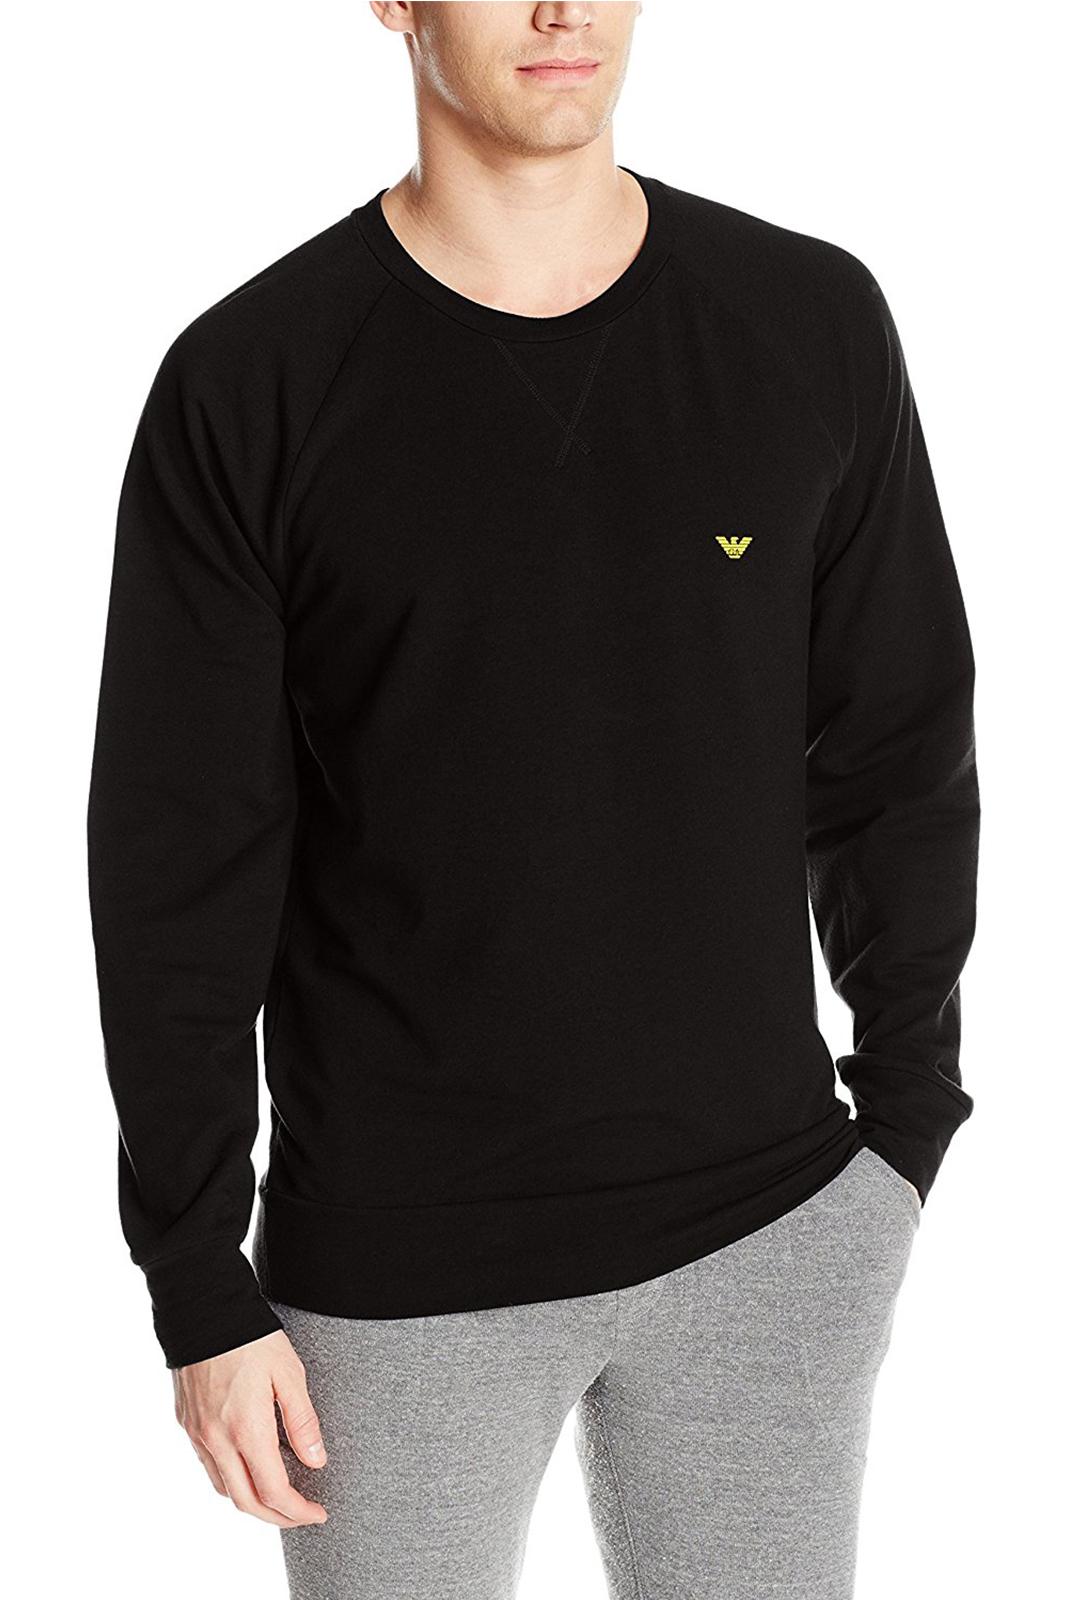 Sweatshirts  Emporio armani 111062 7P575 0020 BLACK